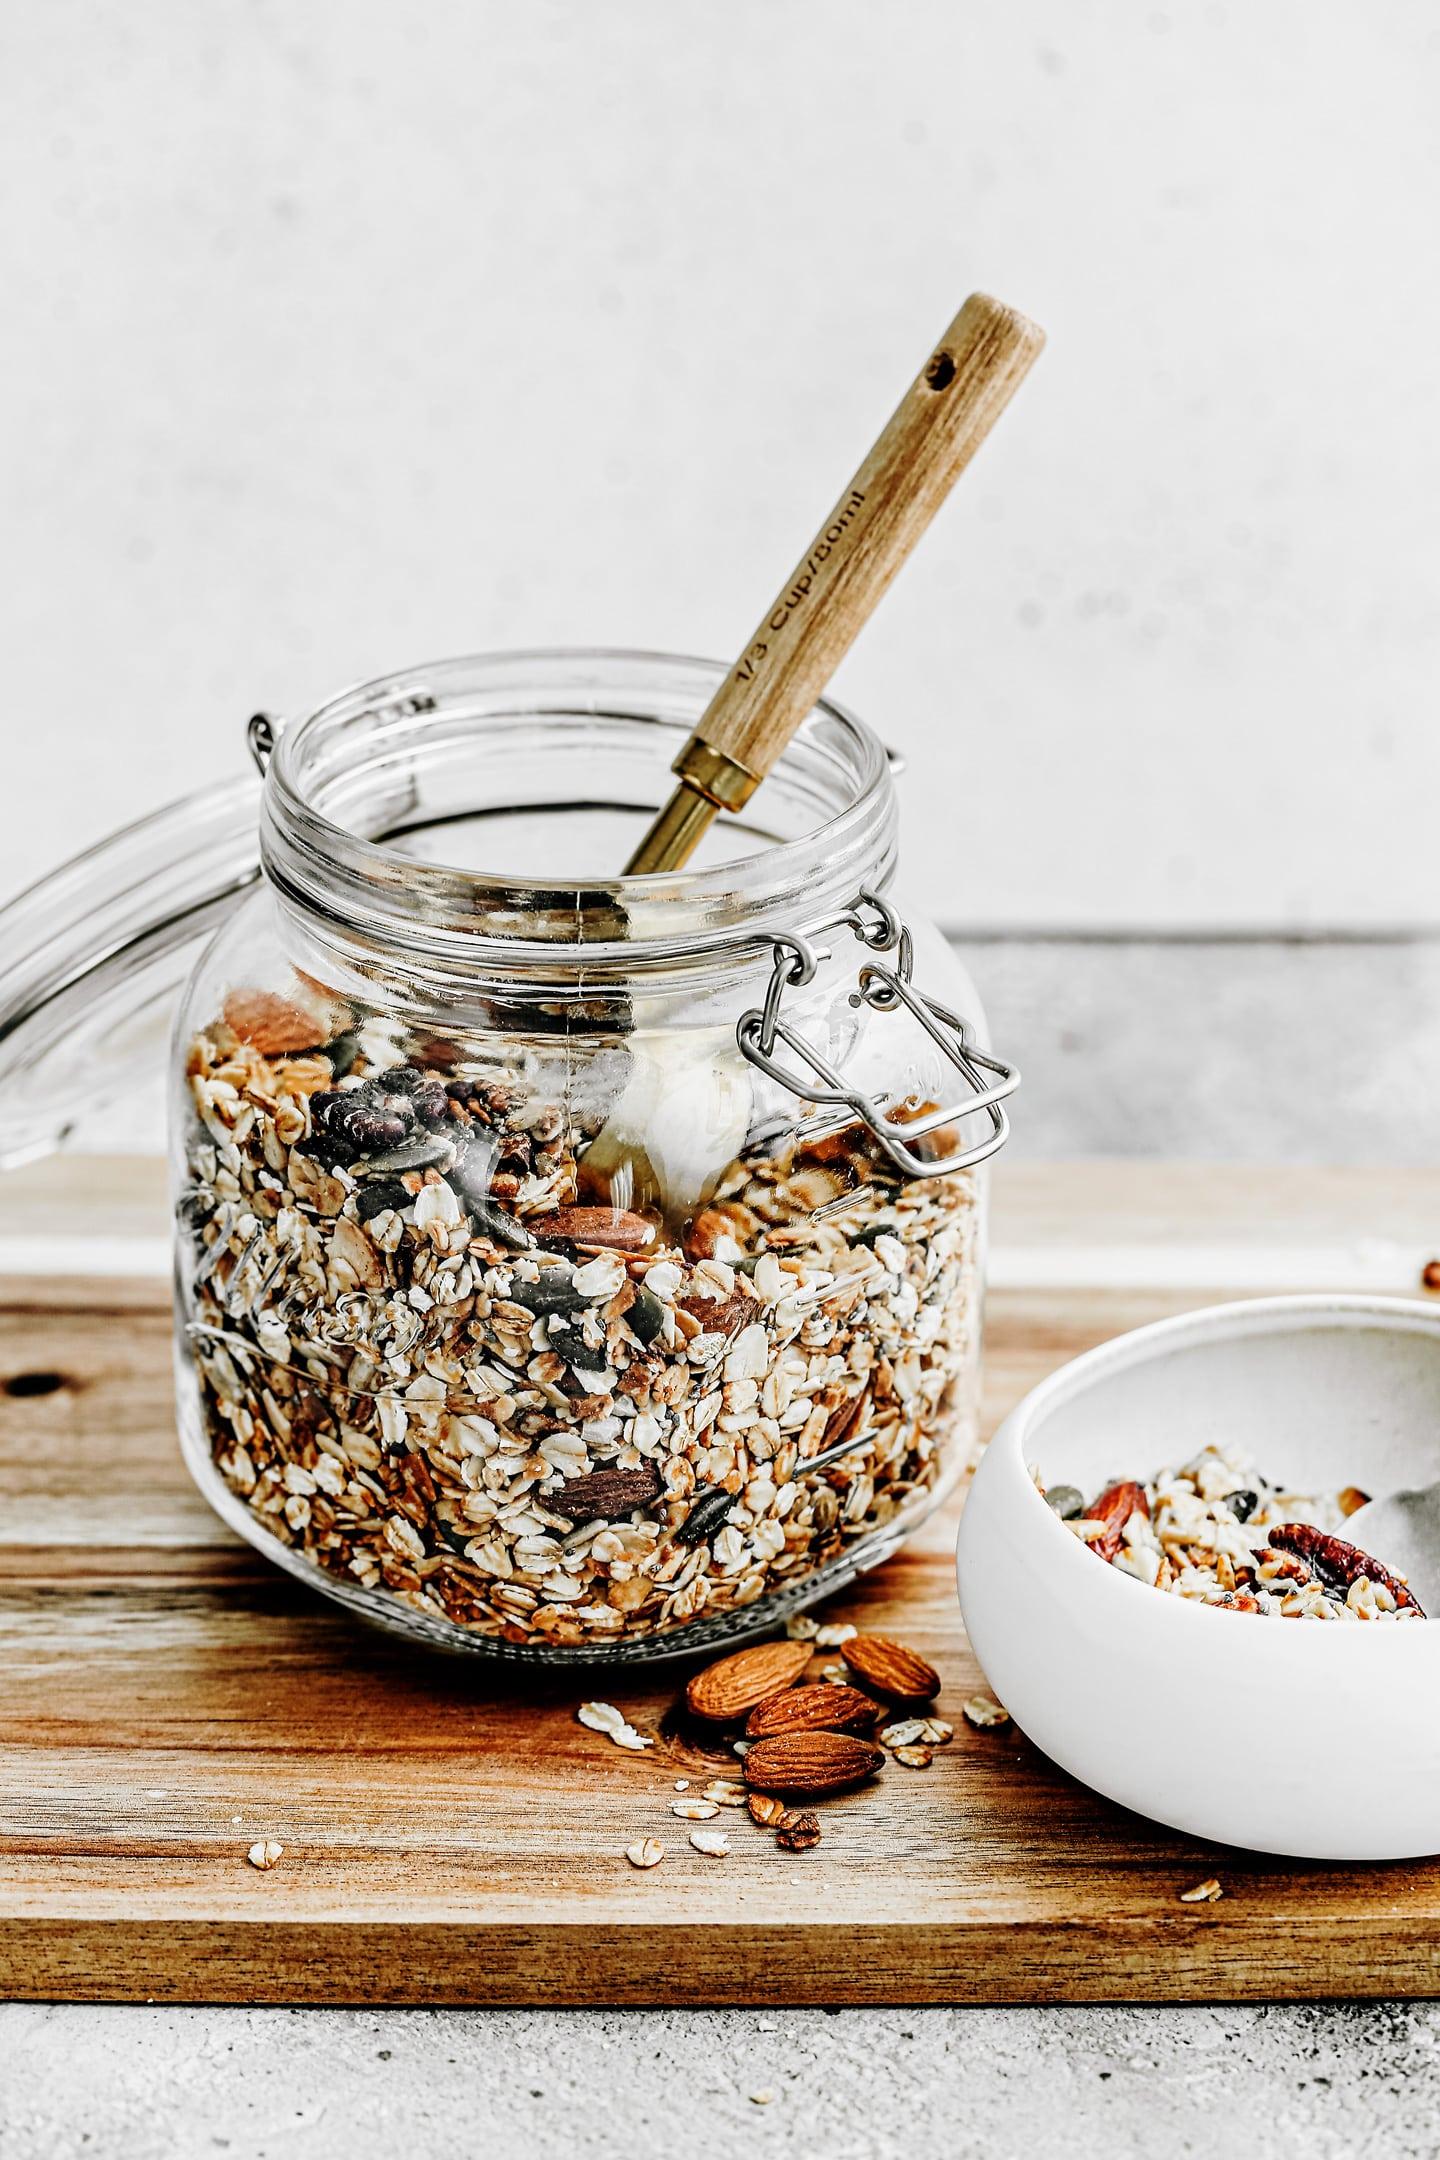 Perfect homemade granola recipe